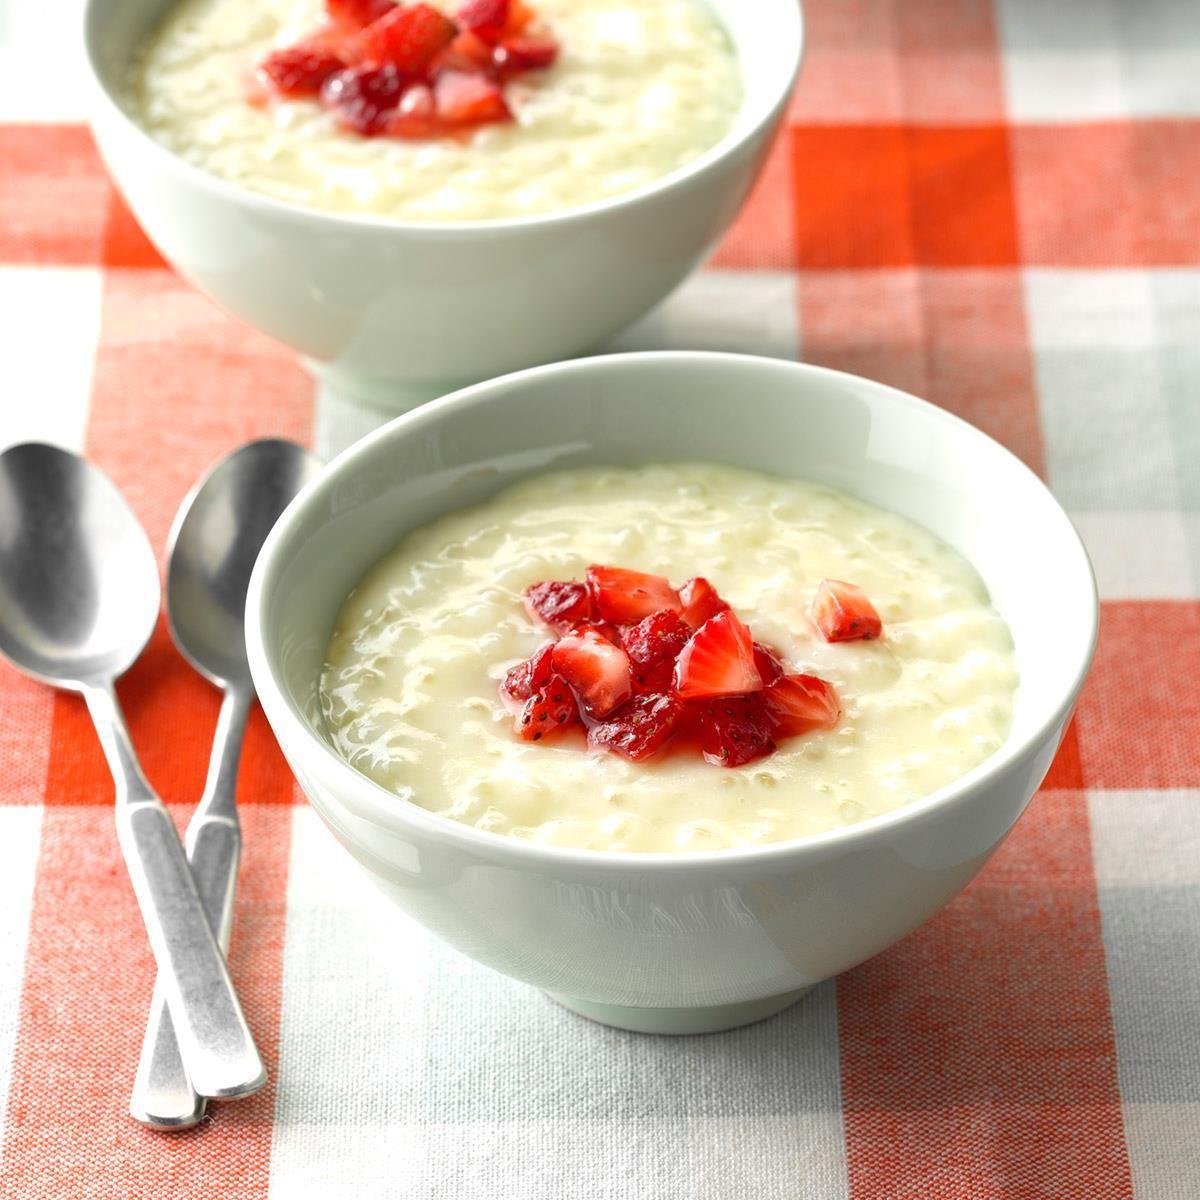 OldFashioned Tapioca Recipe Recipes, Desserts